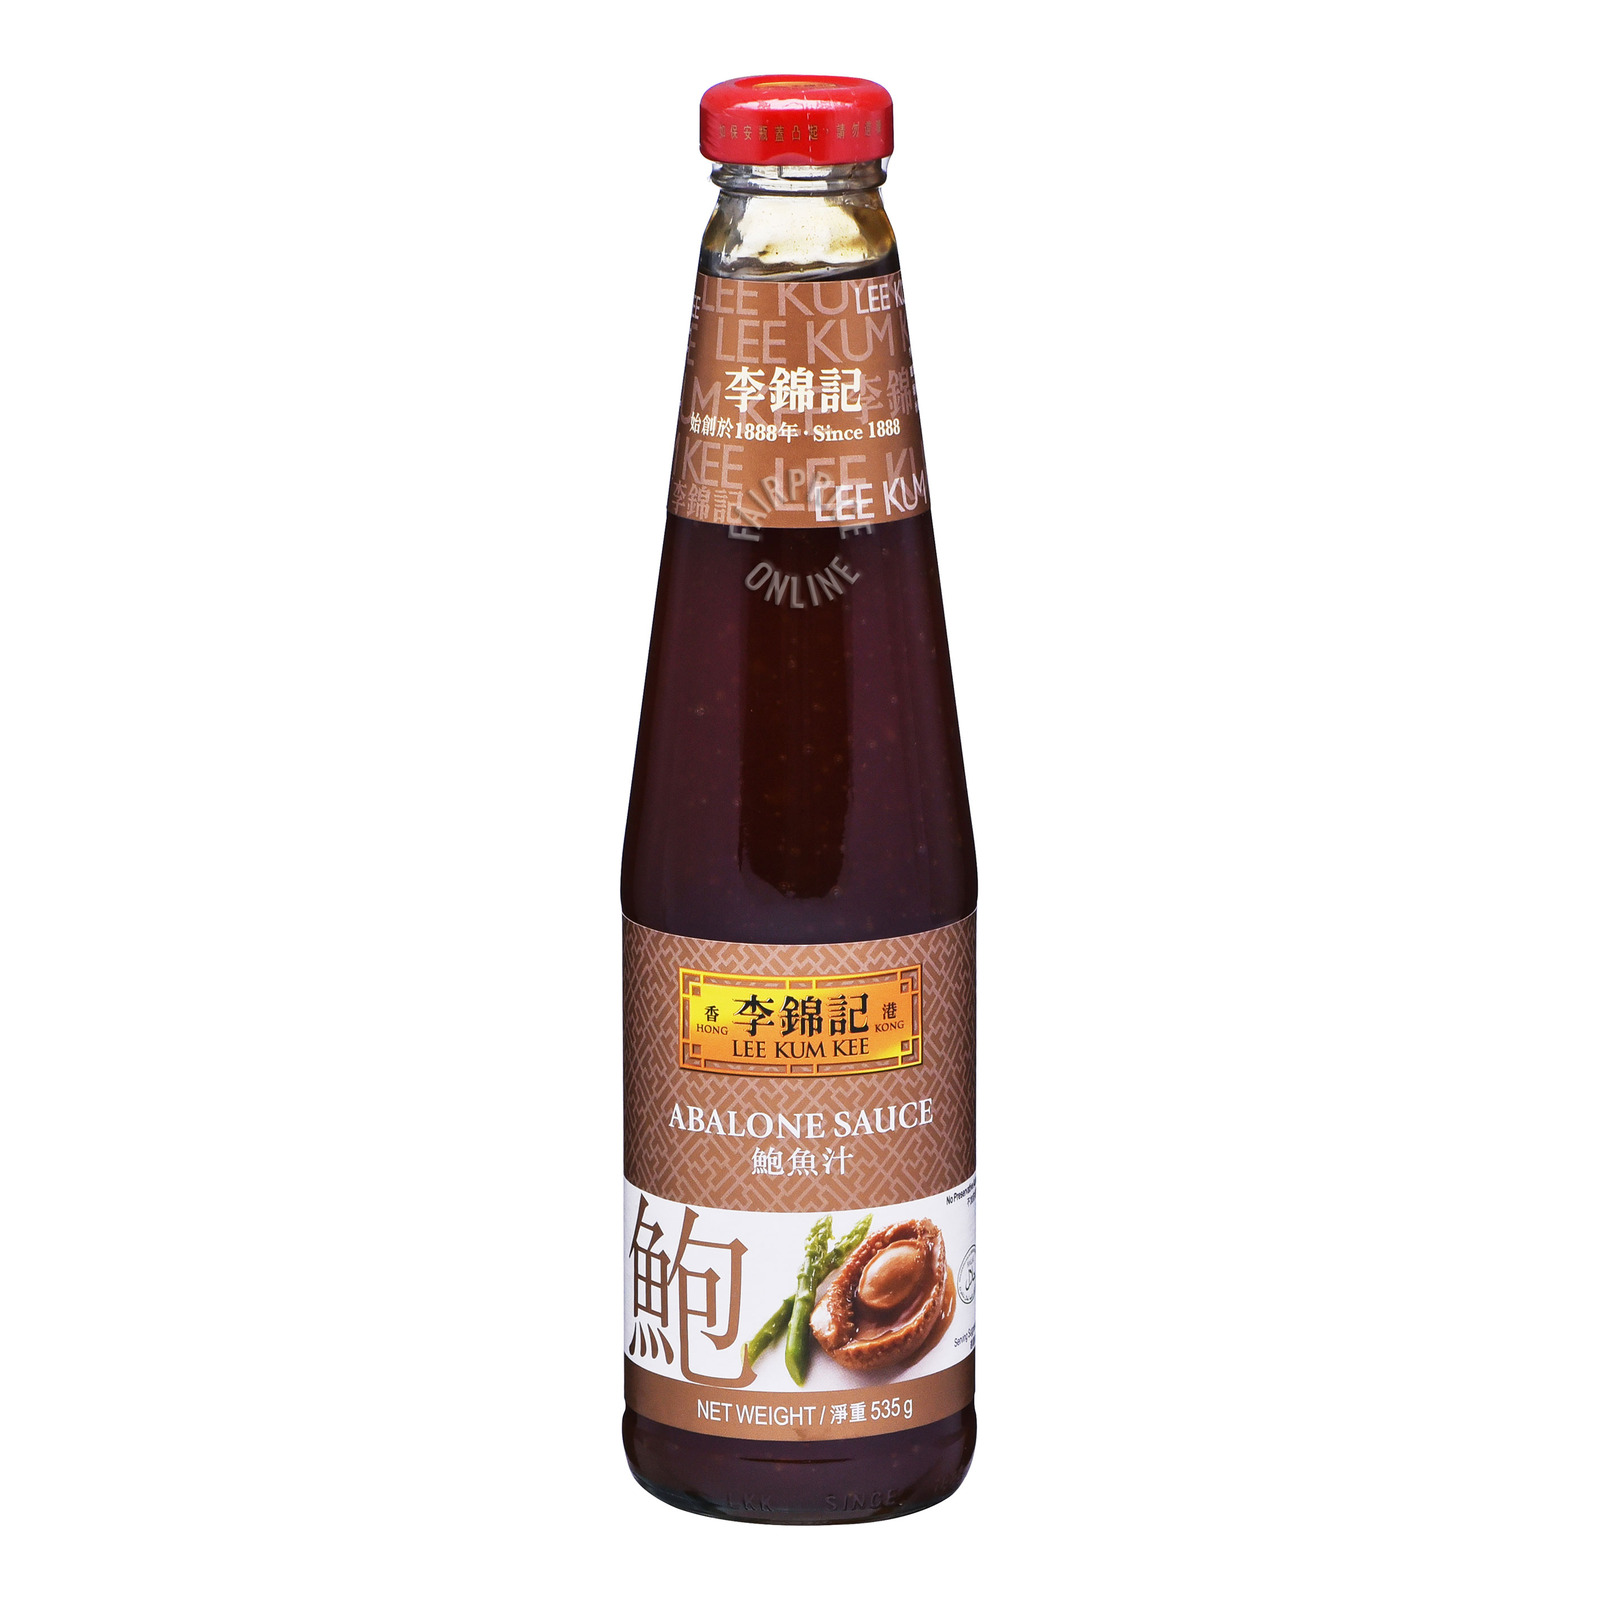 Lee Kum Kee Abalone Sauce